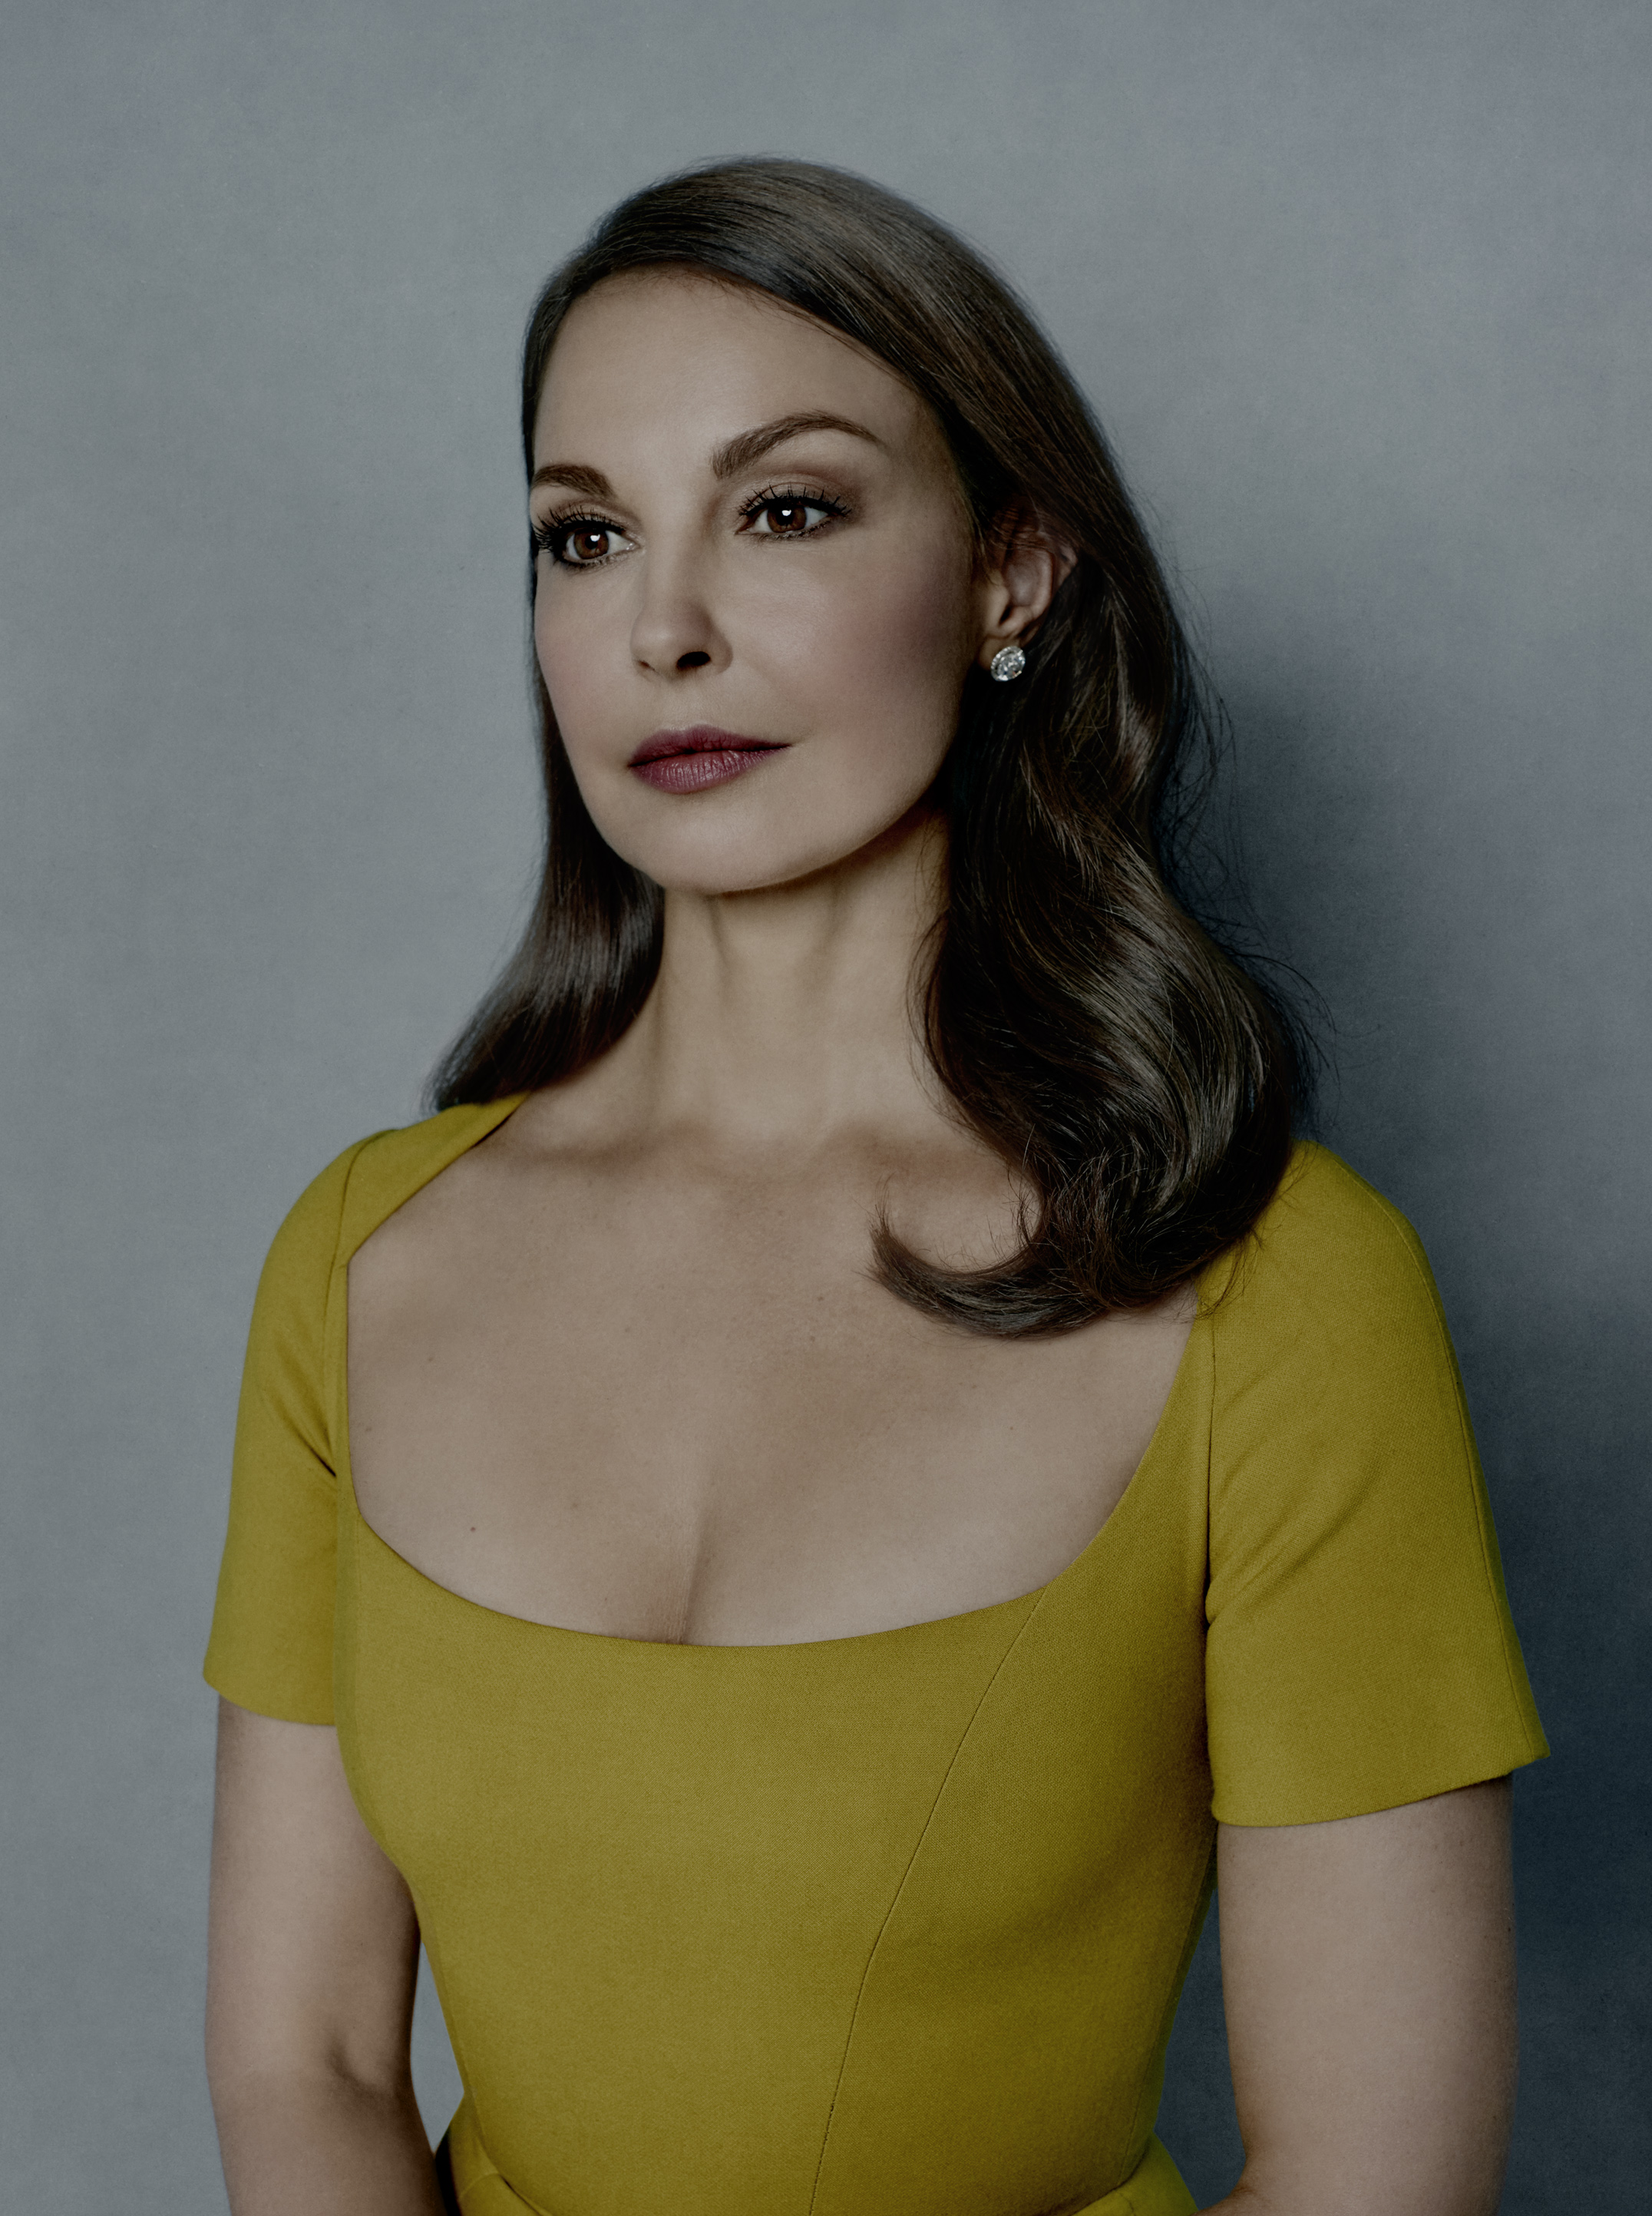 Ashley Judd, actor